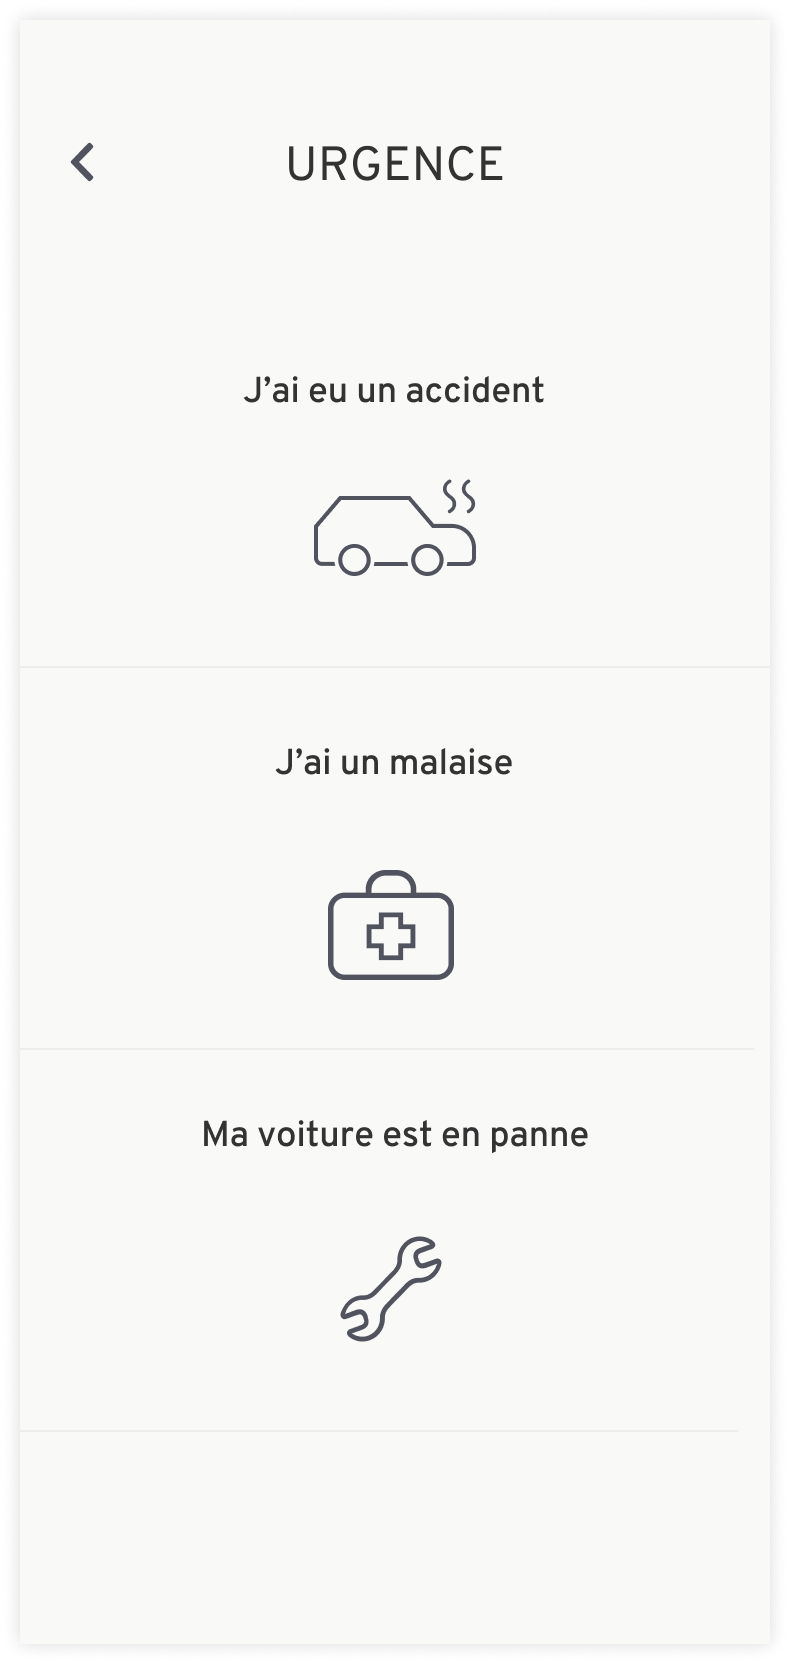 Emergency screen of the app